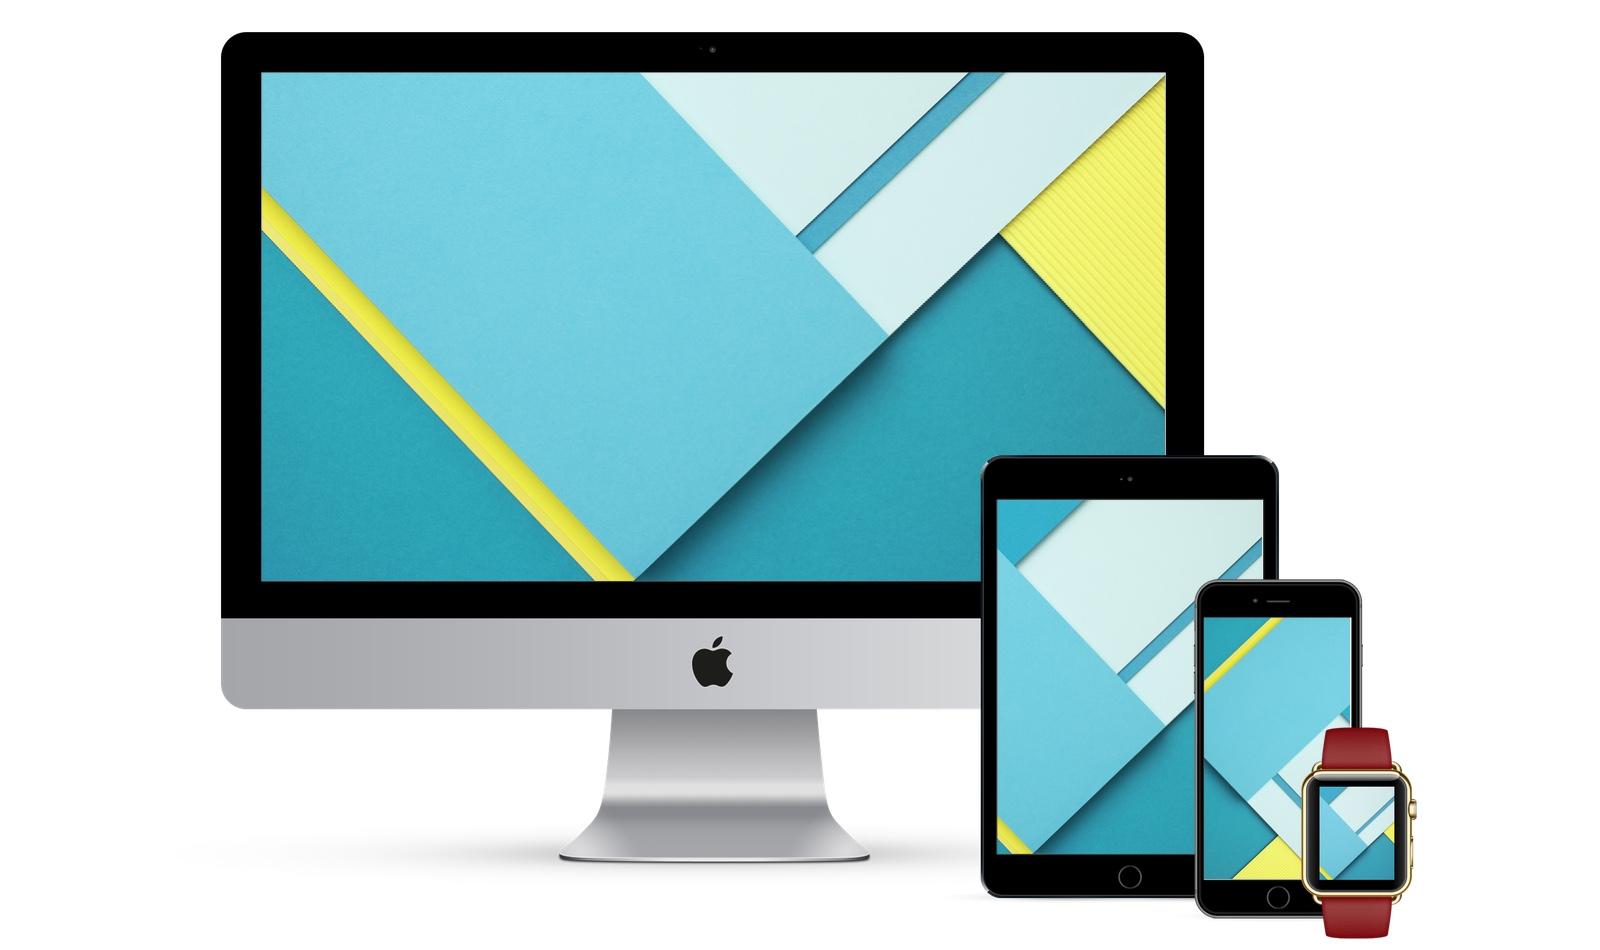 1600x950 Wallpaper Weekends Google Io Paper For Mac, Iphone, Ipad,